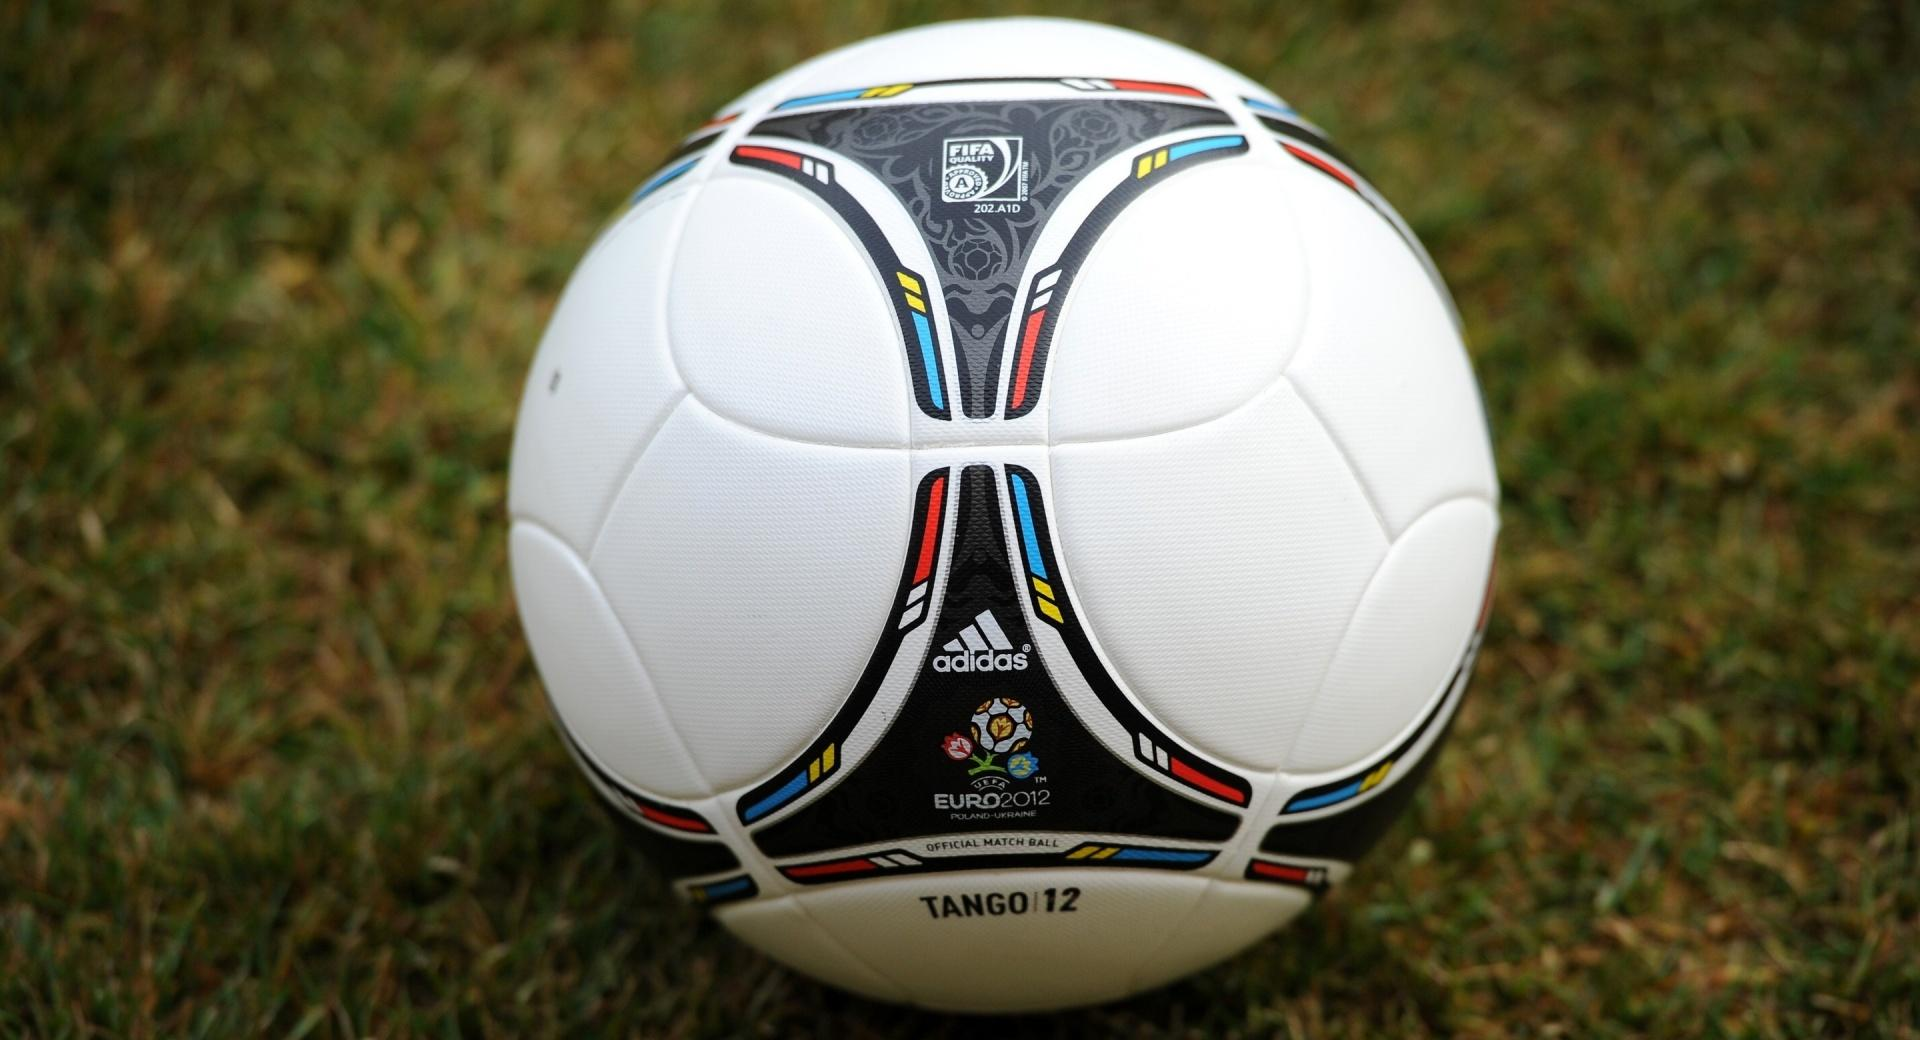 Tango 12 Soccer Ball wallpapers HD quality